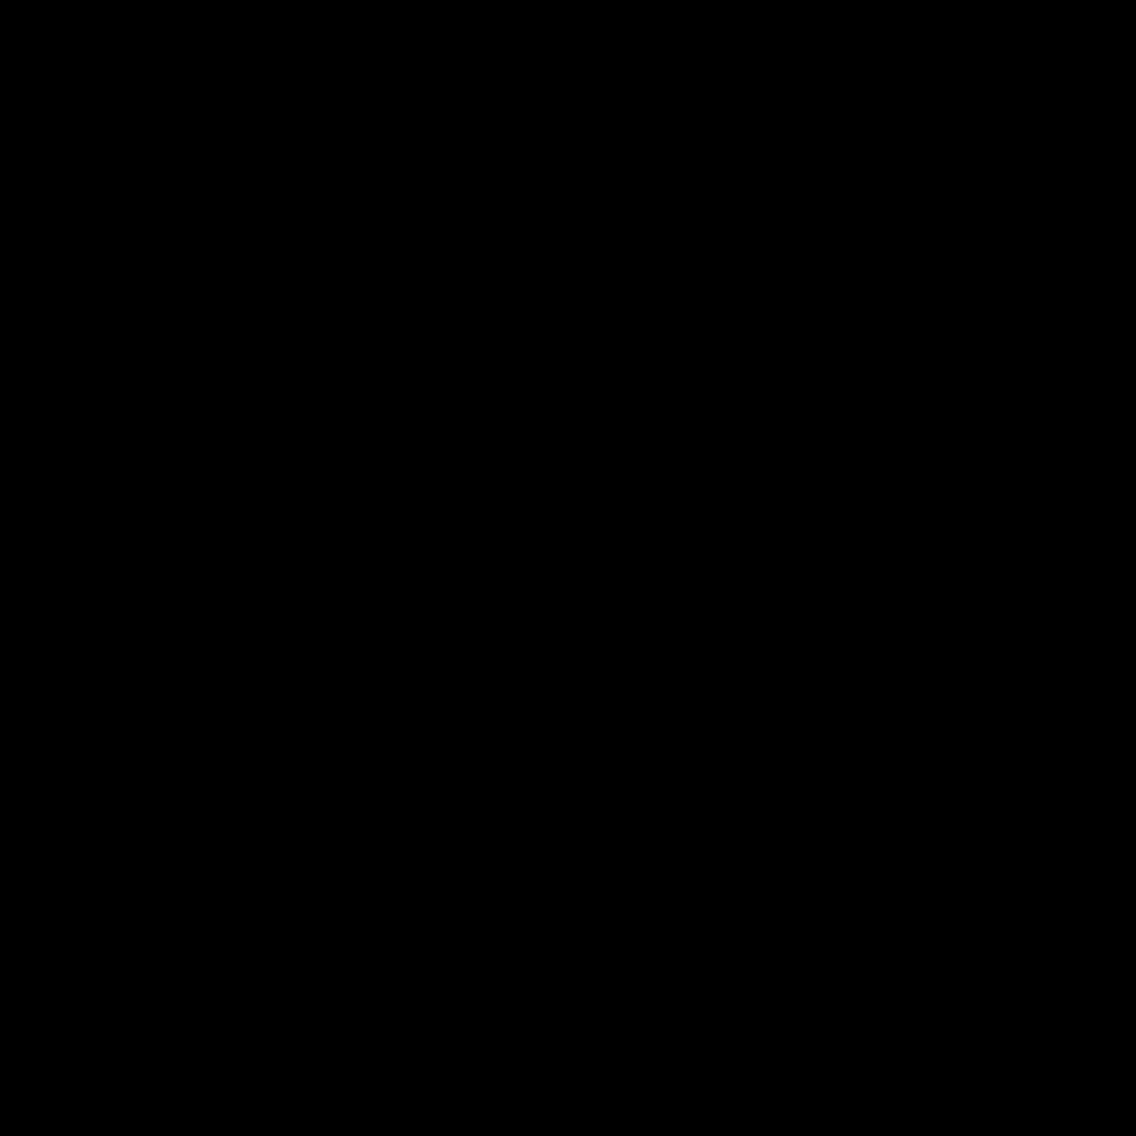 arrow bohemian boho divider header border frame decor d...